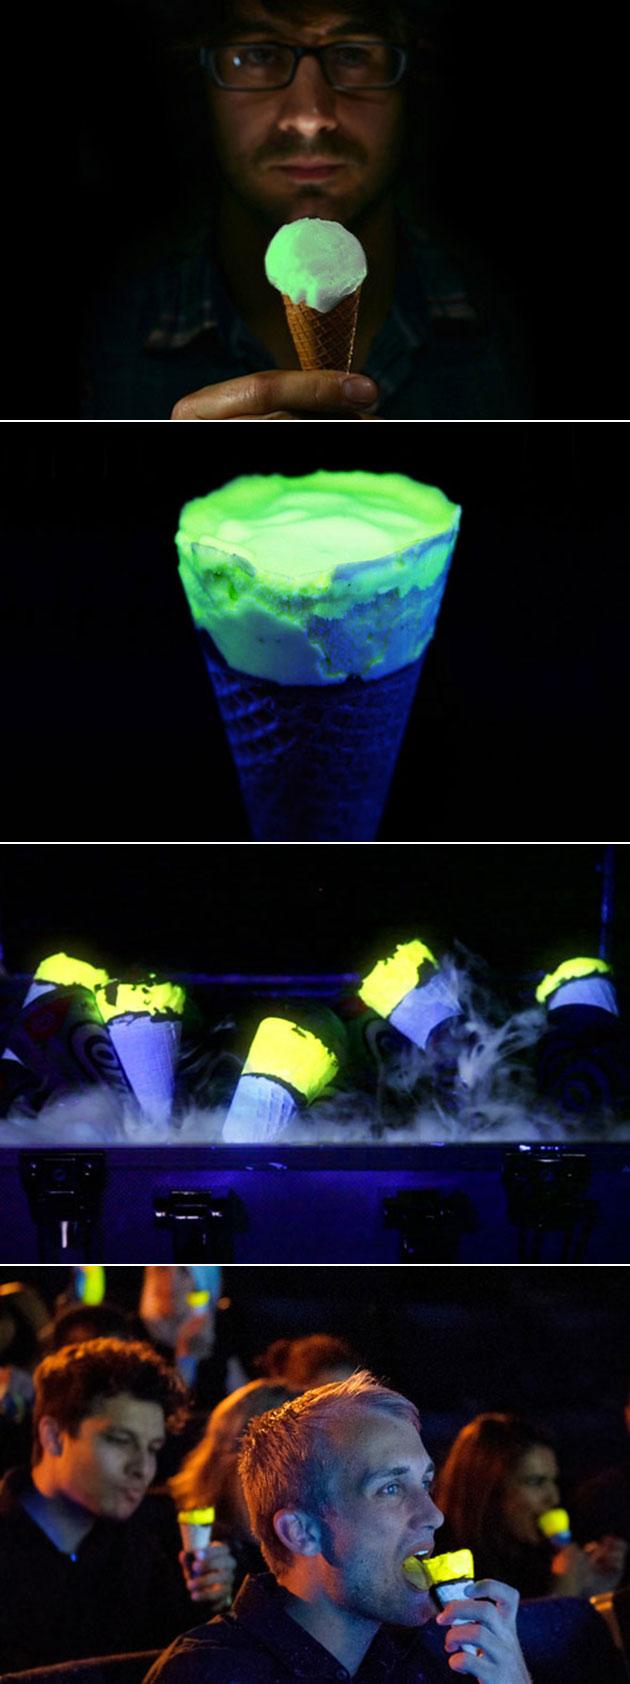 Glow-in-the-Dark Ice Cream